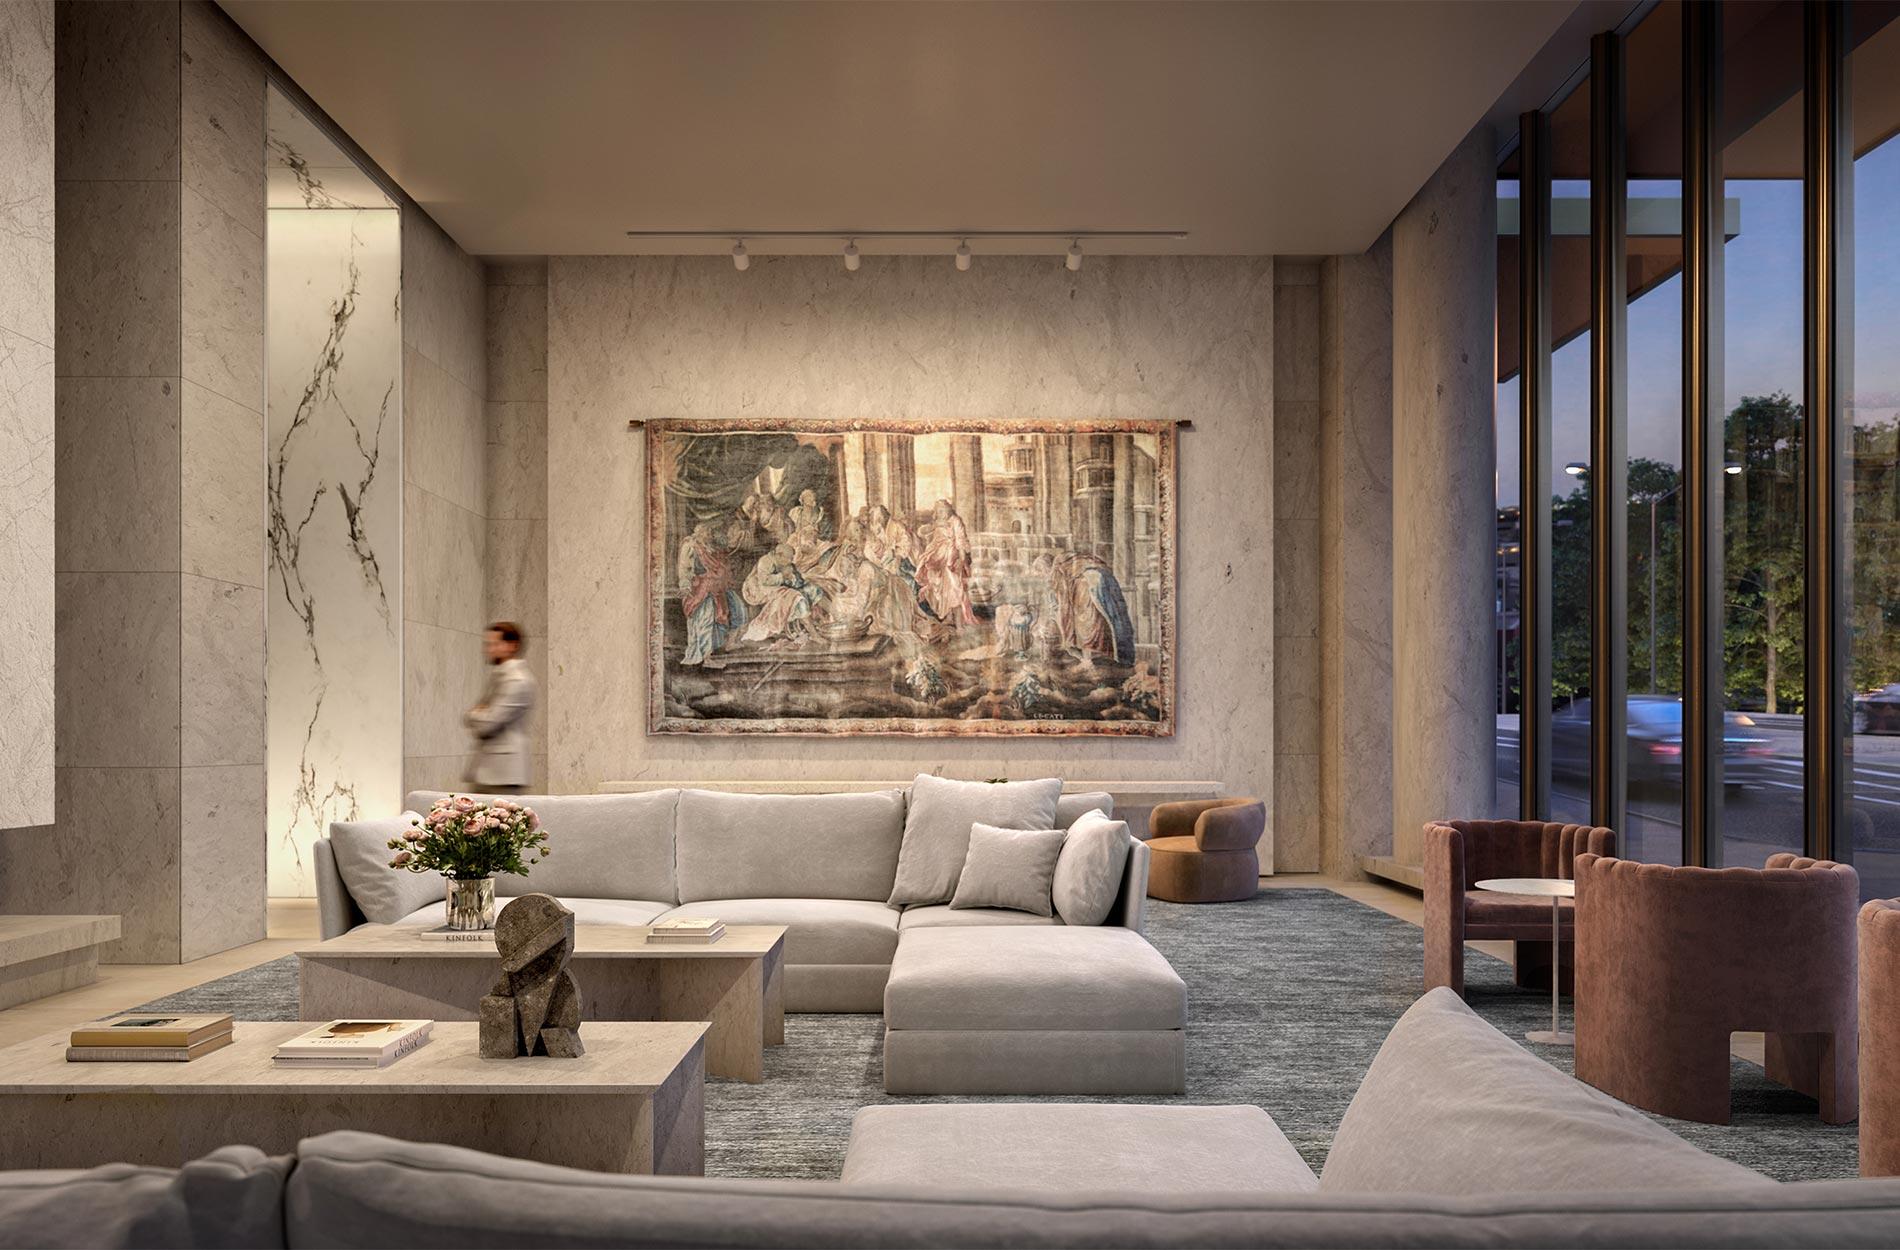 Sydney Interior Designers: The Top 10 Modern Chairs Inspirations sydney interior designers Sydney Interior Designers: The Top 10 Modern Chairs Inspirations Best Interior Designers in Sydney Bates Smart